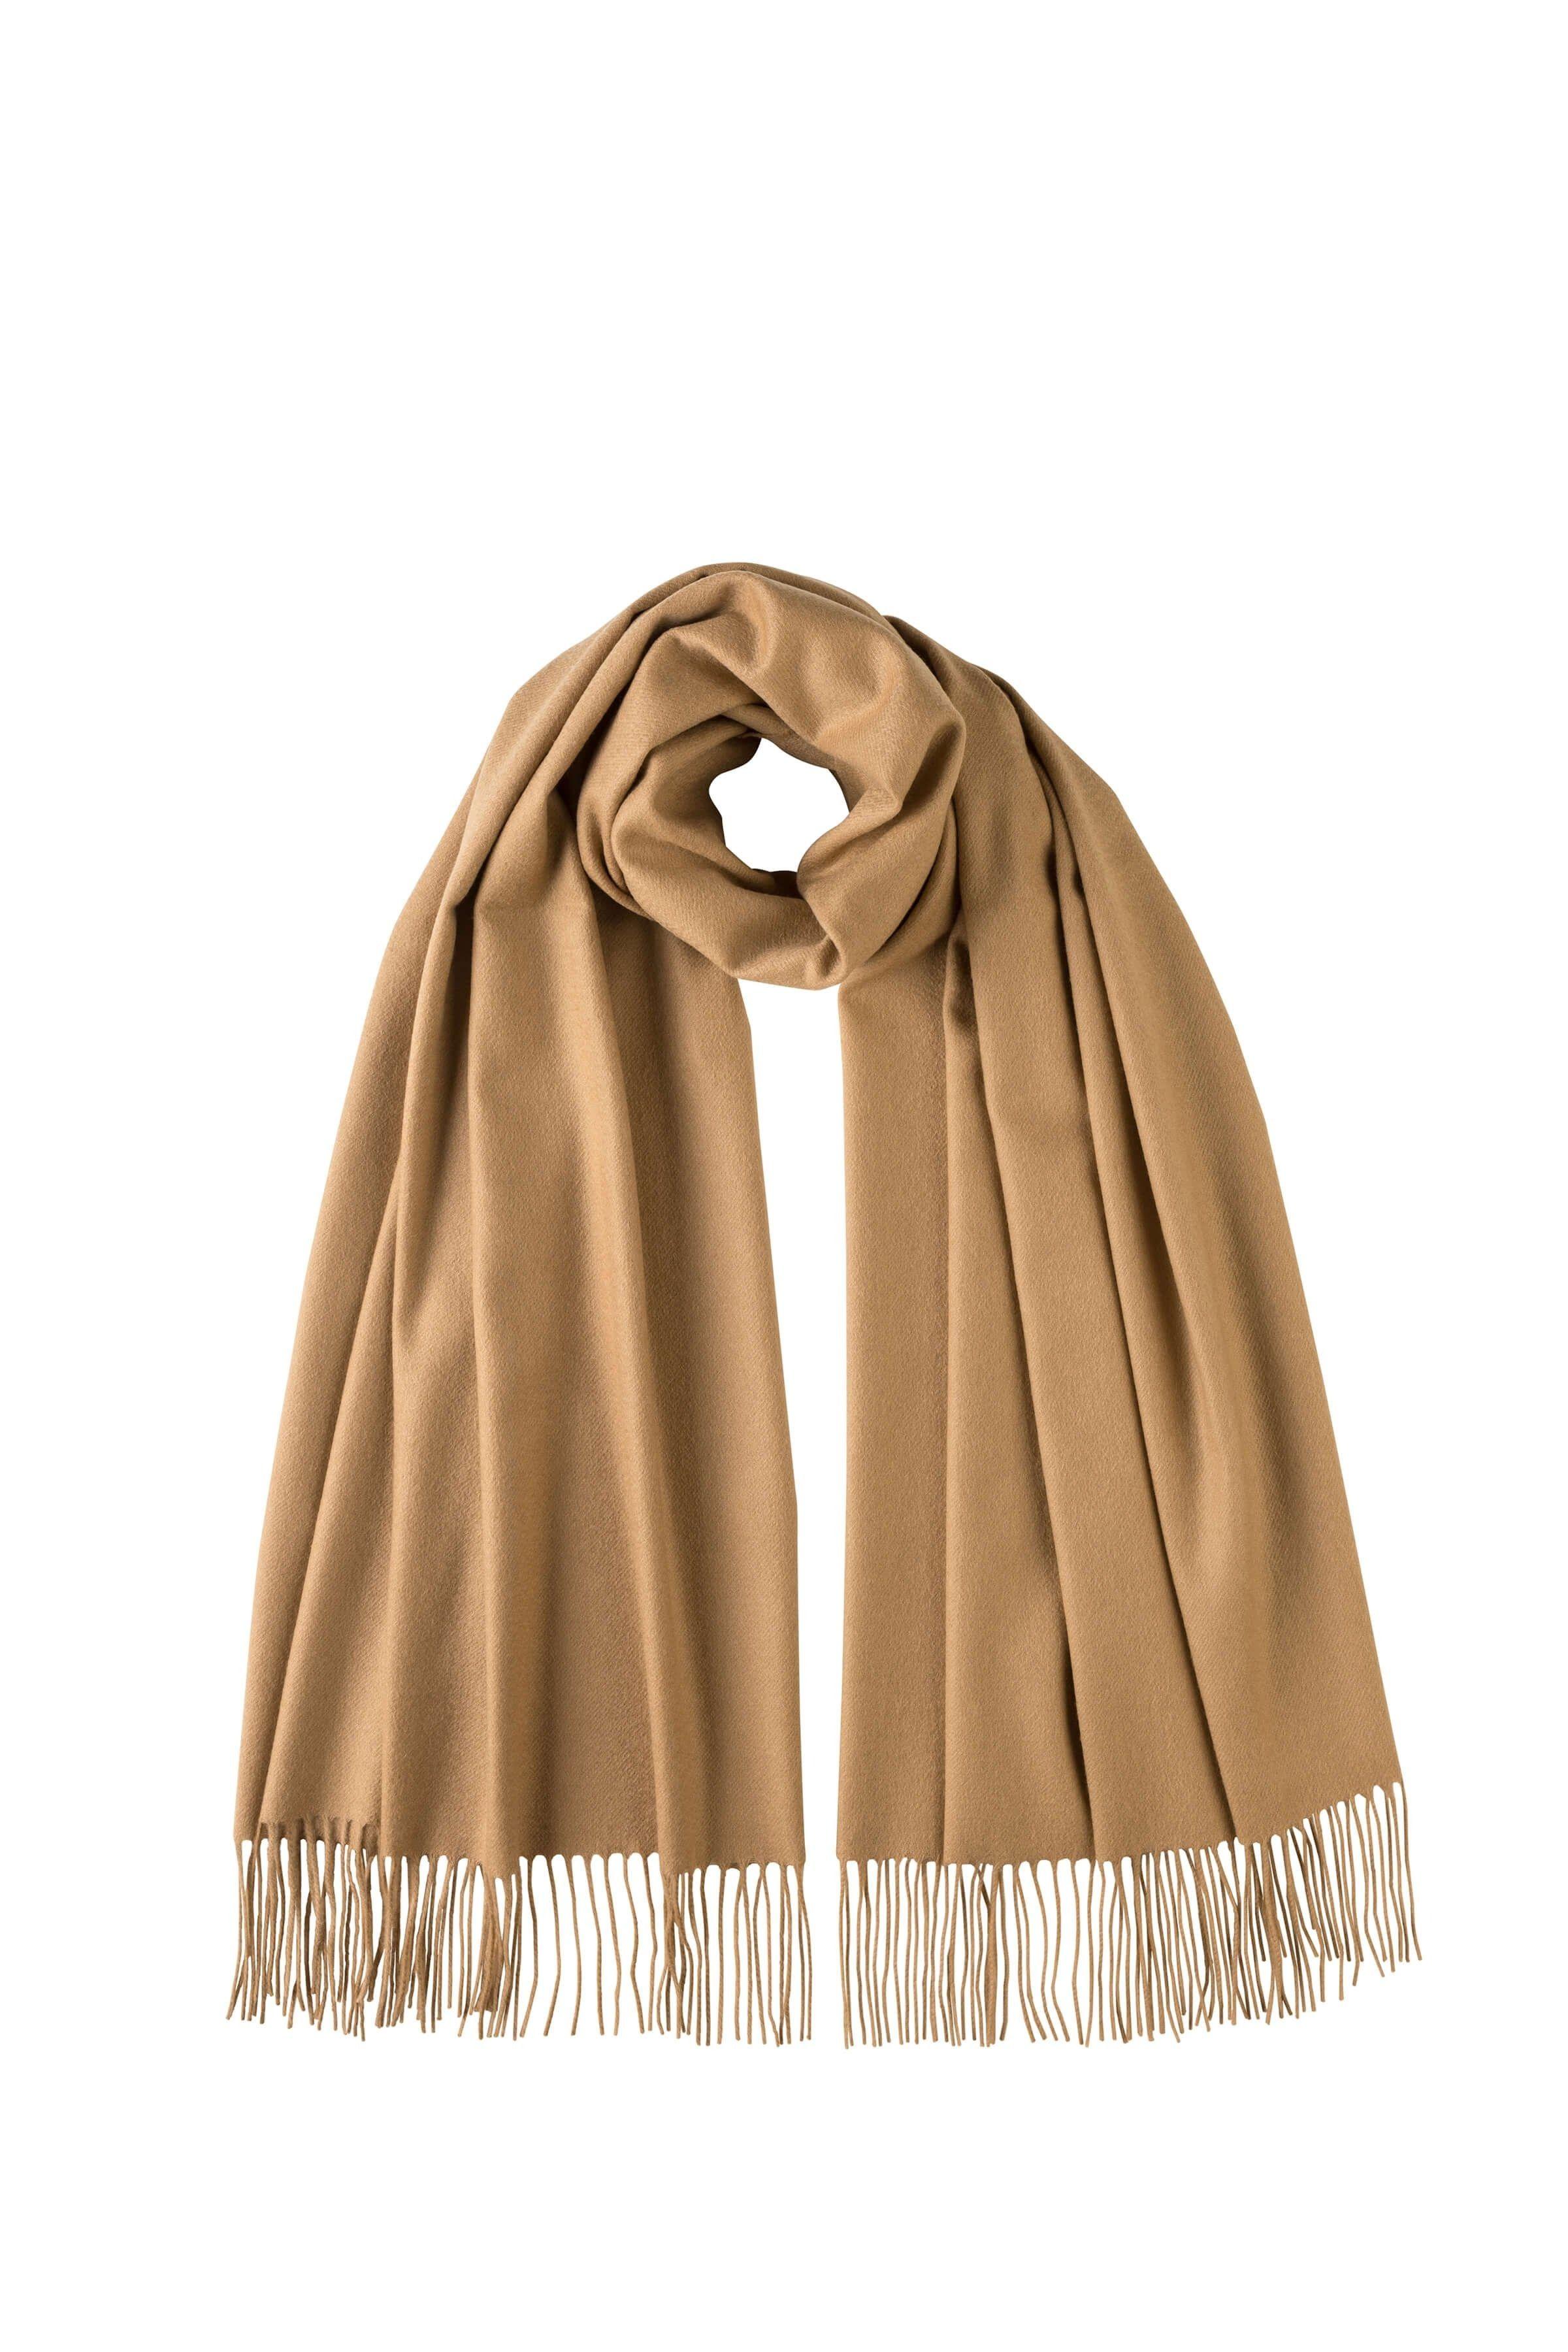 Luxury Women/'s Cashmere Feel Shawl Scarf Wrap Blanket Pashmina Style CLEARANCE